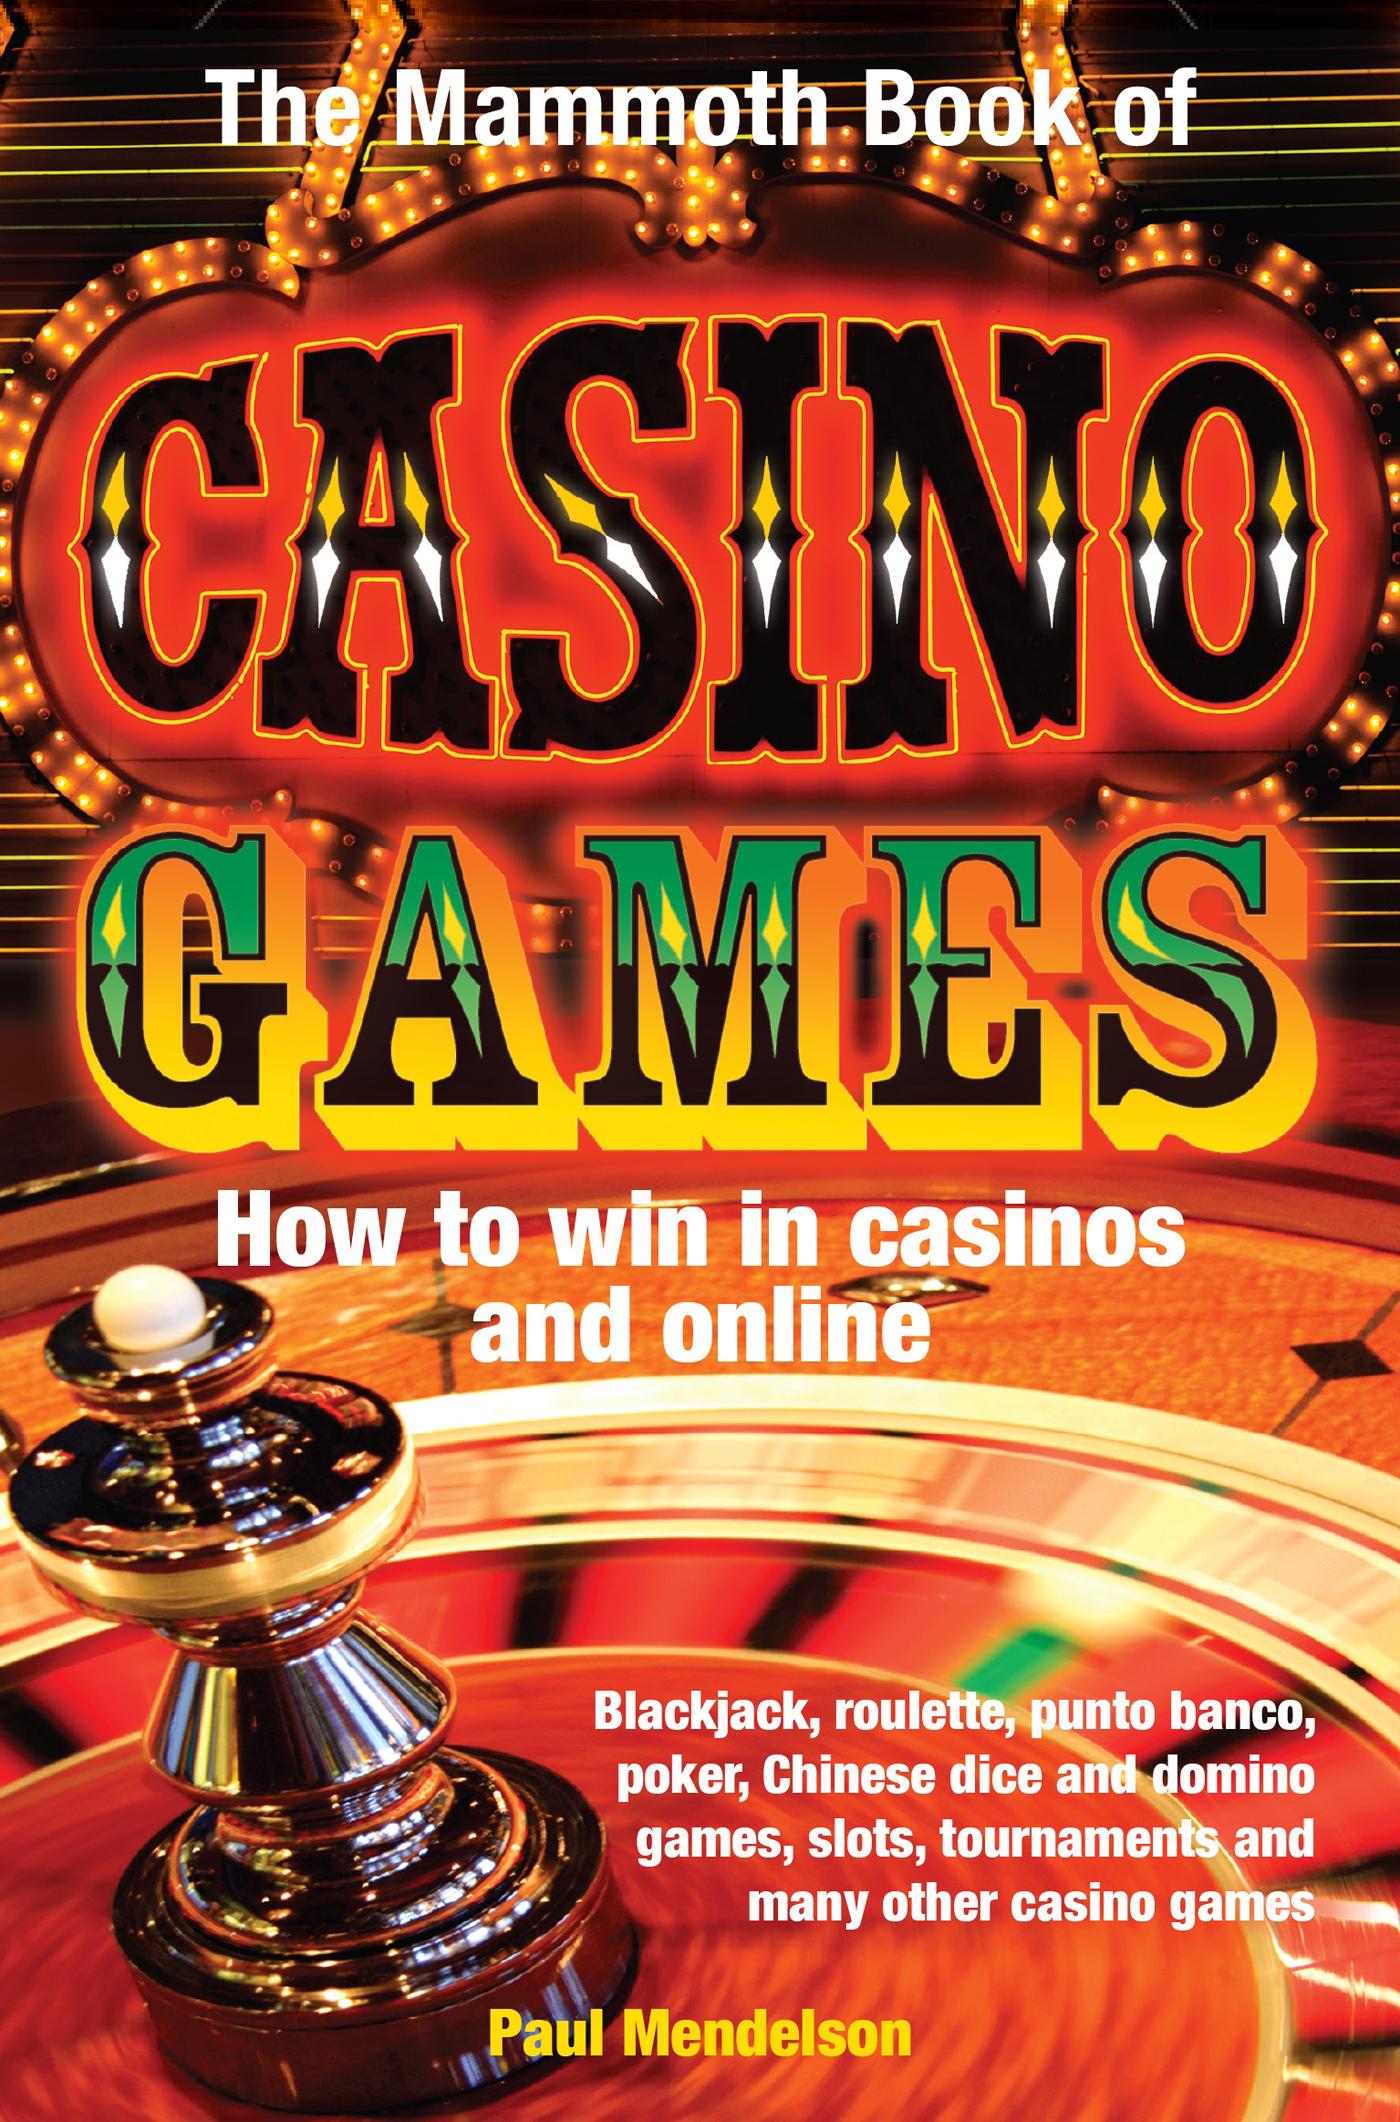 Free book - win online casino gambling las vegas casino and pet friendly